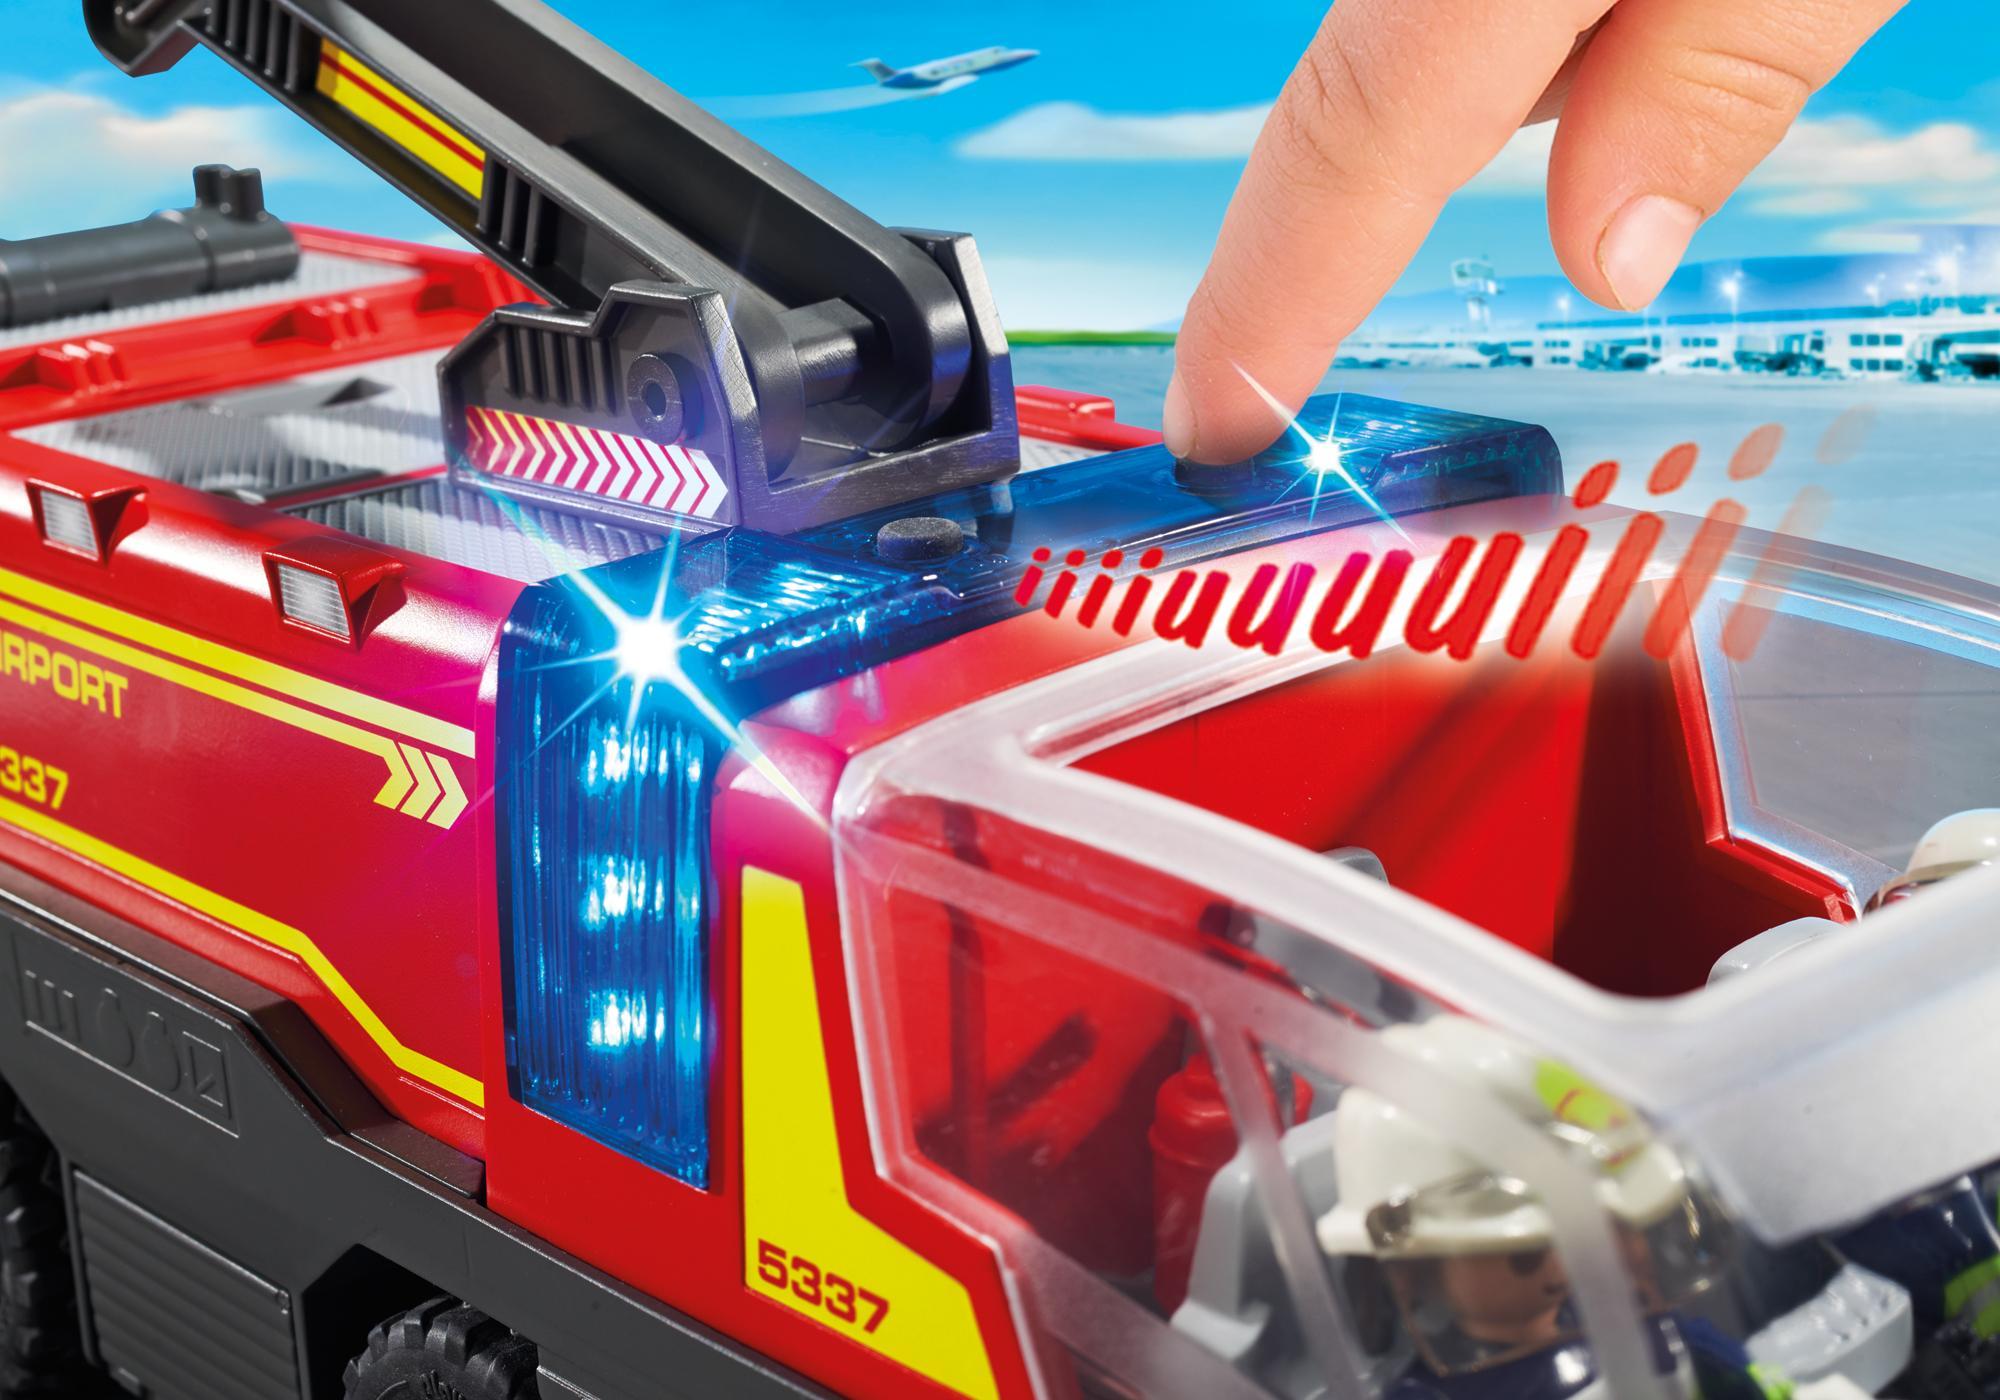 http://media.playmobil.com/i/playmobil/5337_product_extra1/Luchthavenbrandweer met licht en geluid